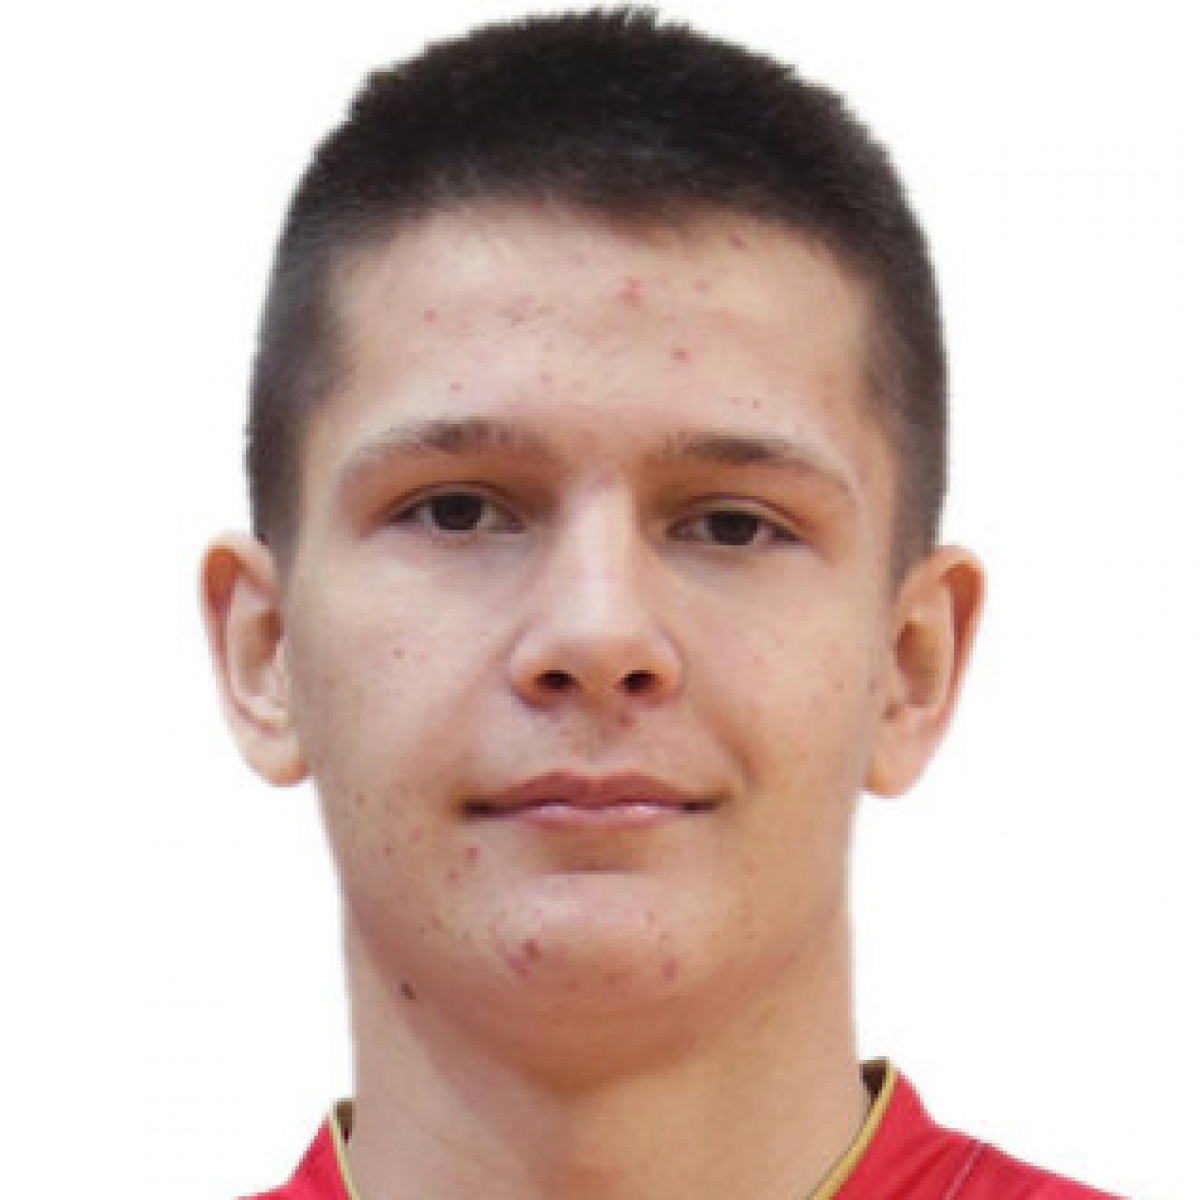 Arijan Lakic